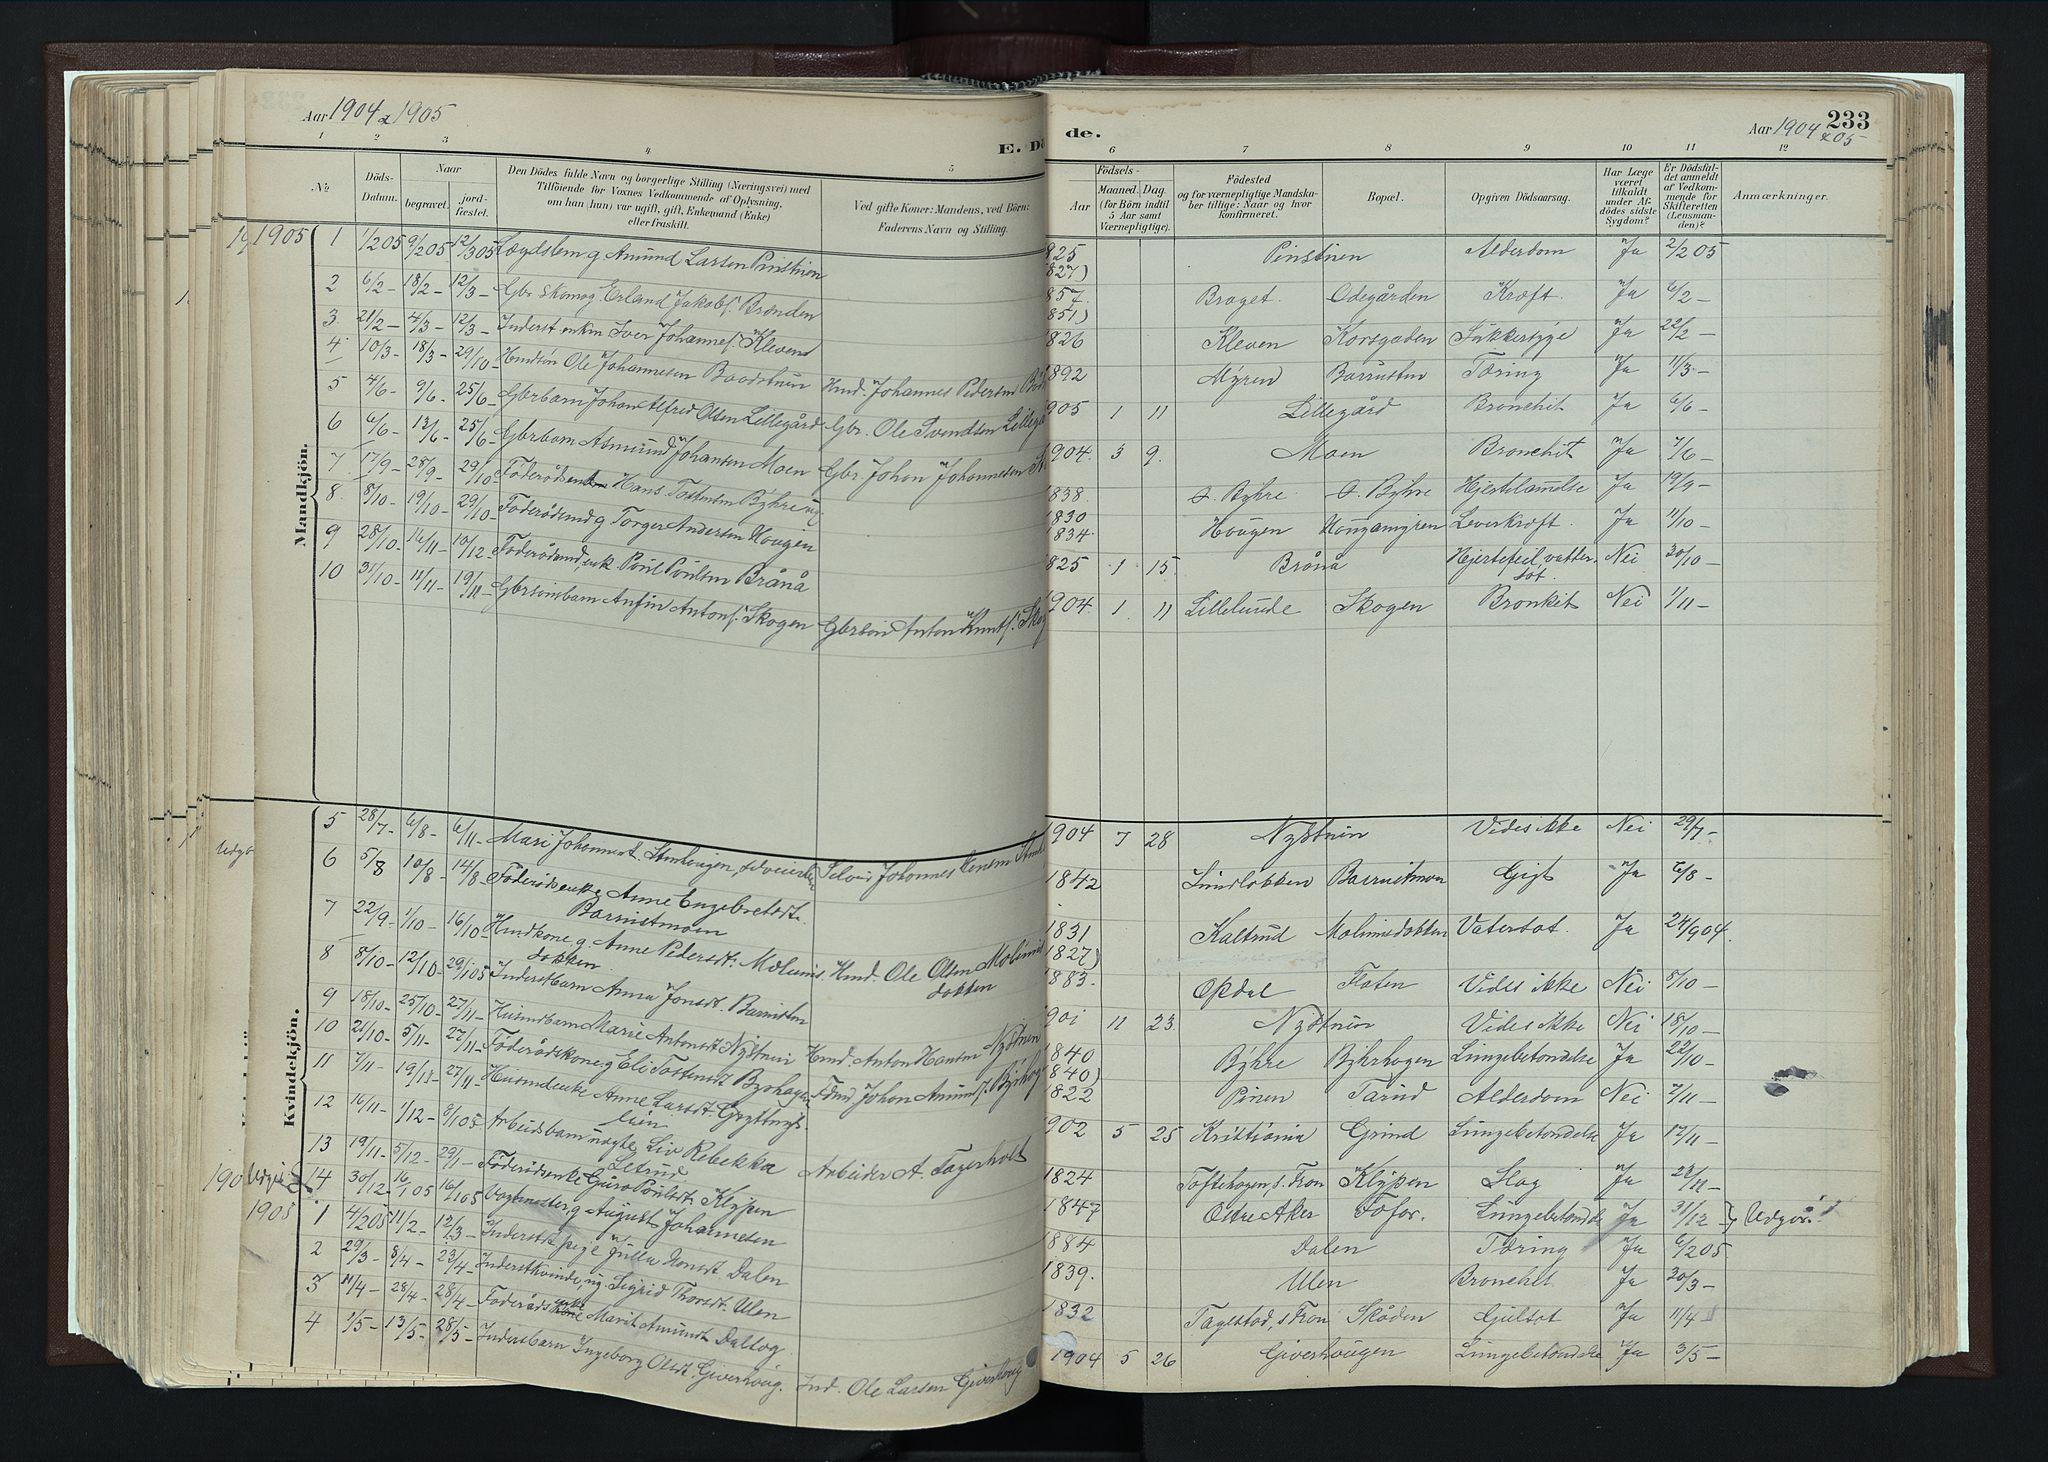 SAH, Nord-Fron prestekontor, Ministerialbok nr. 4, 1884-1914, s. 233